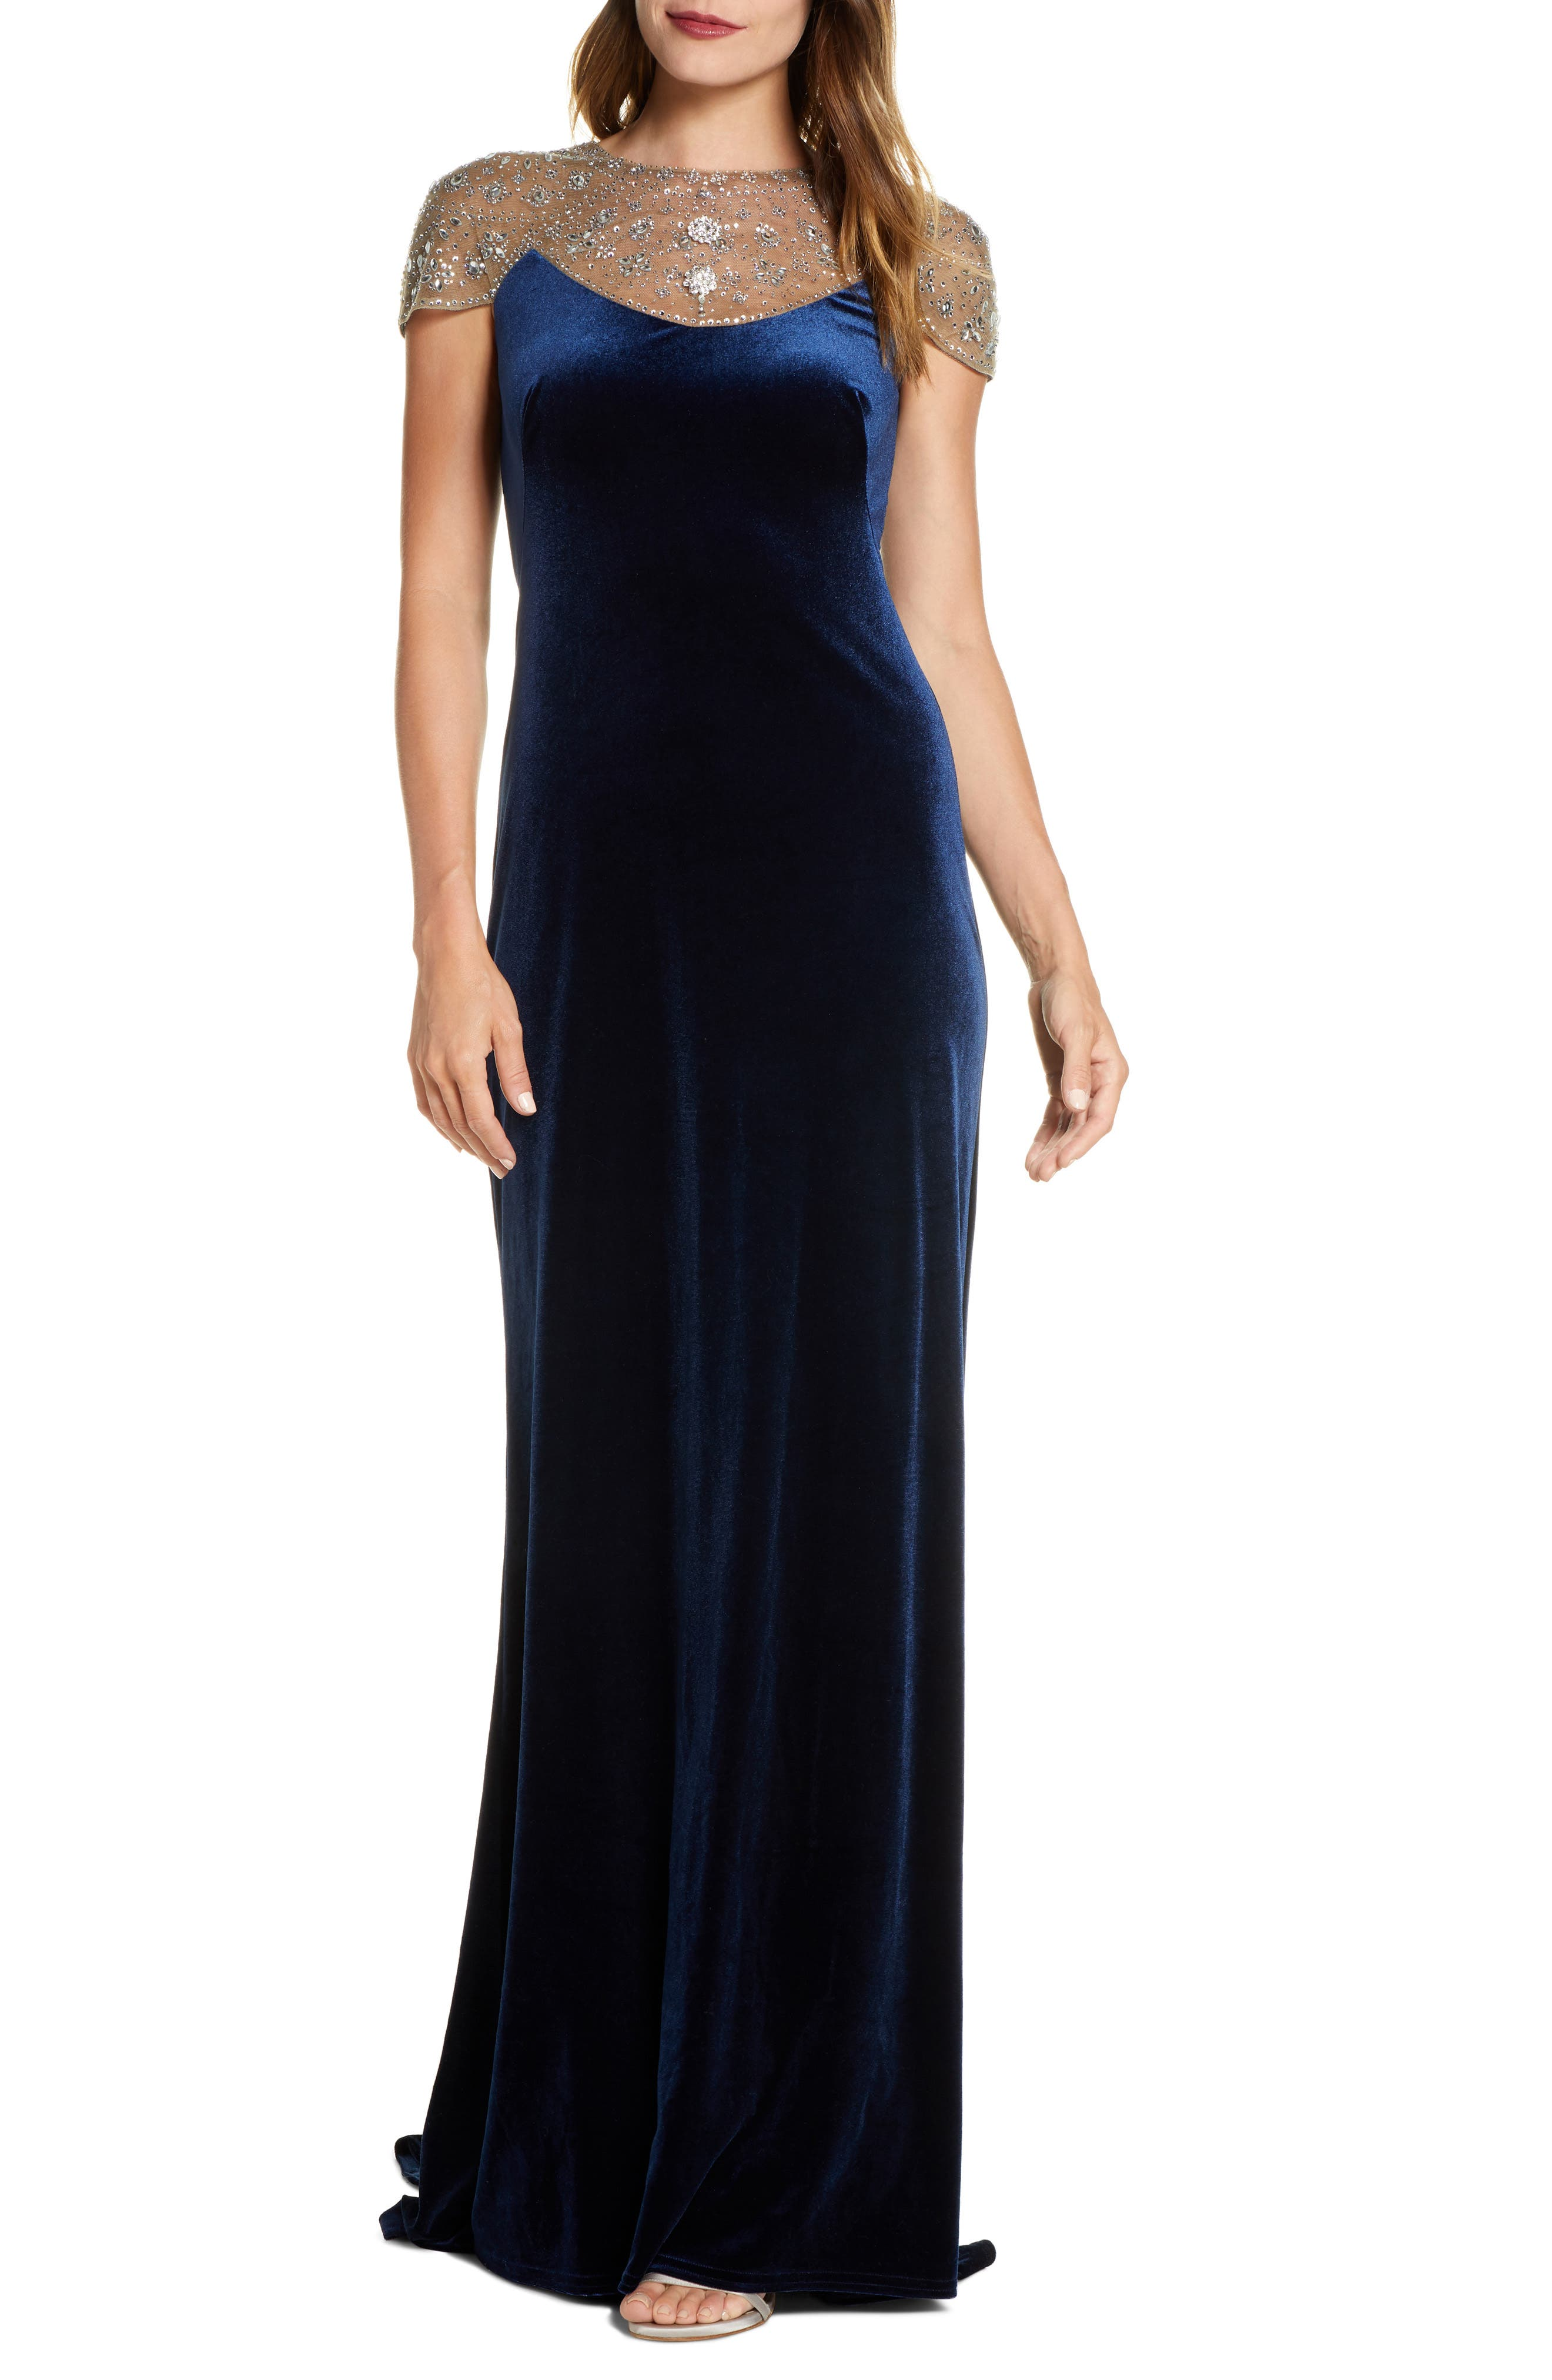 1930s Style Clothing and Fashion Womens Tadashi Shoji Embellished Velvet Gown $588.00 AT vintagedancer.com